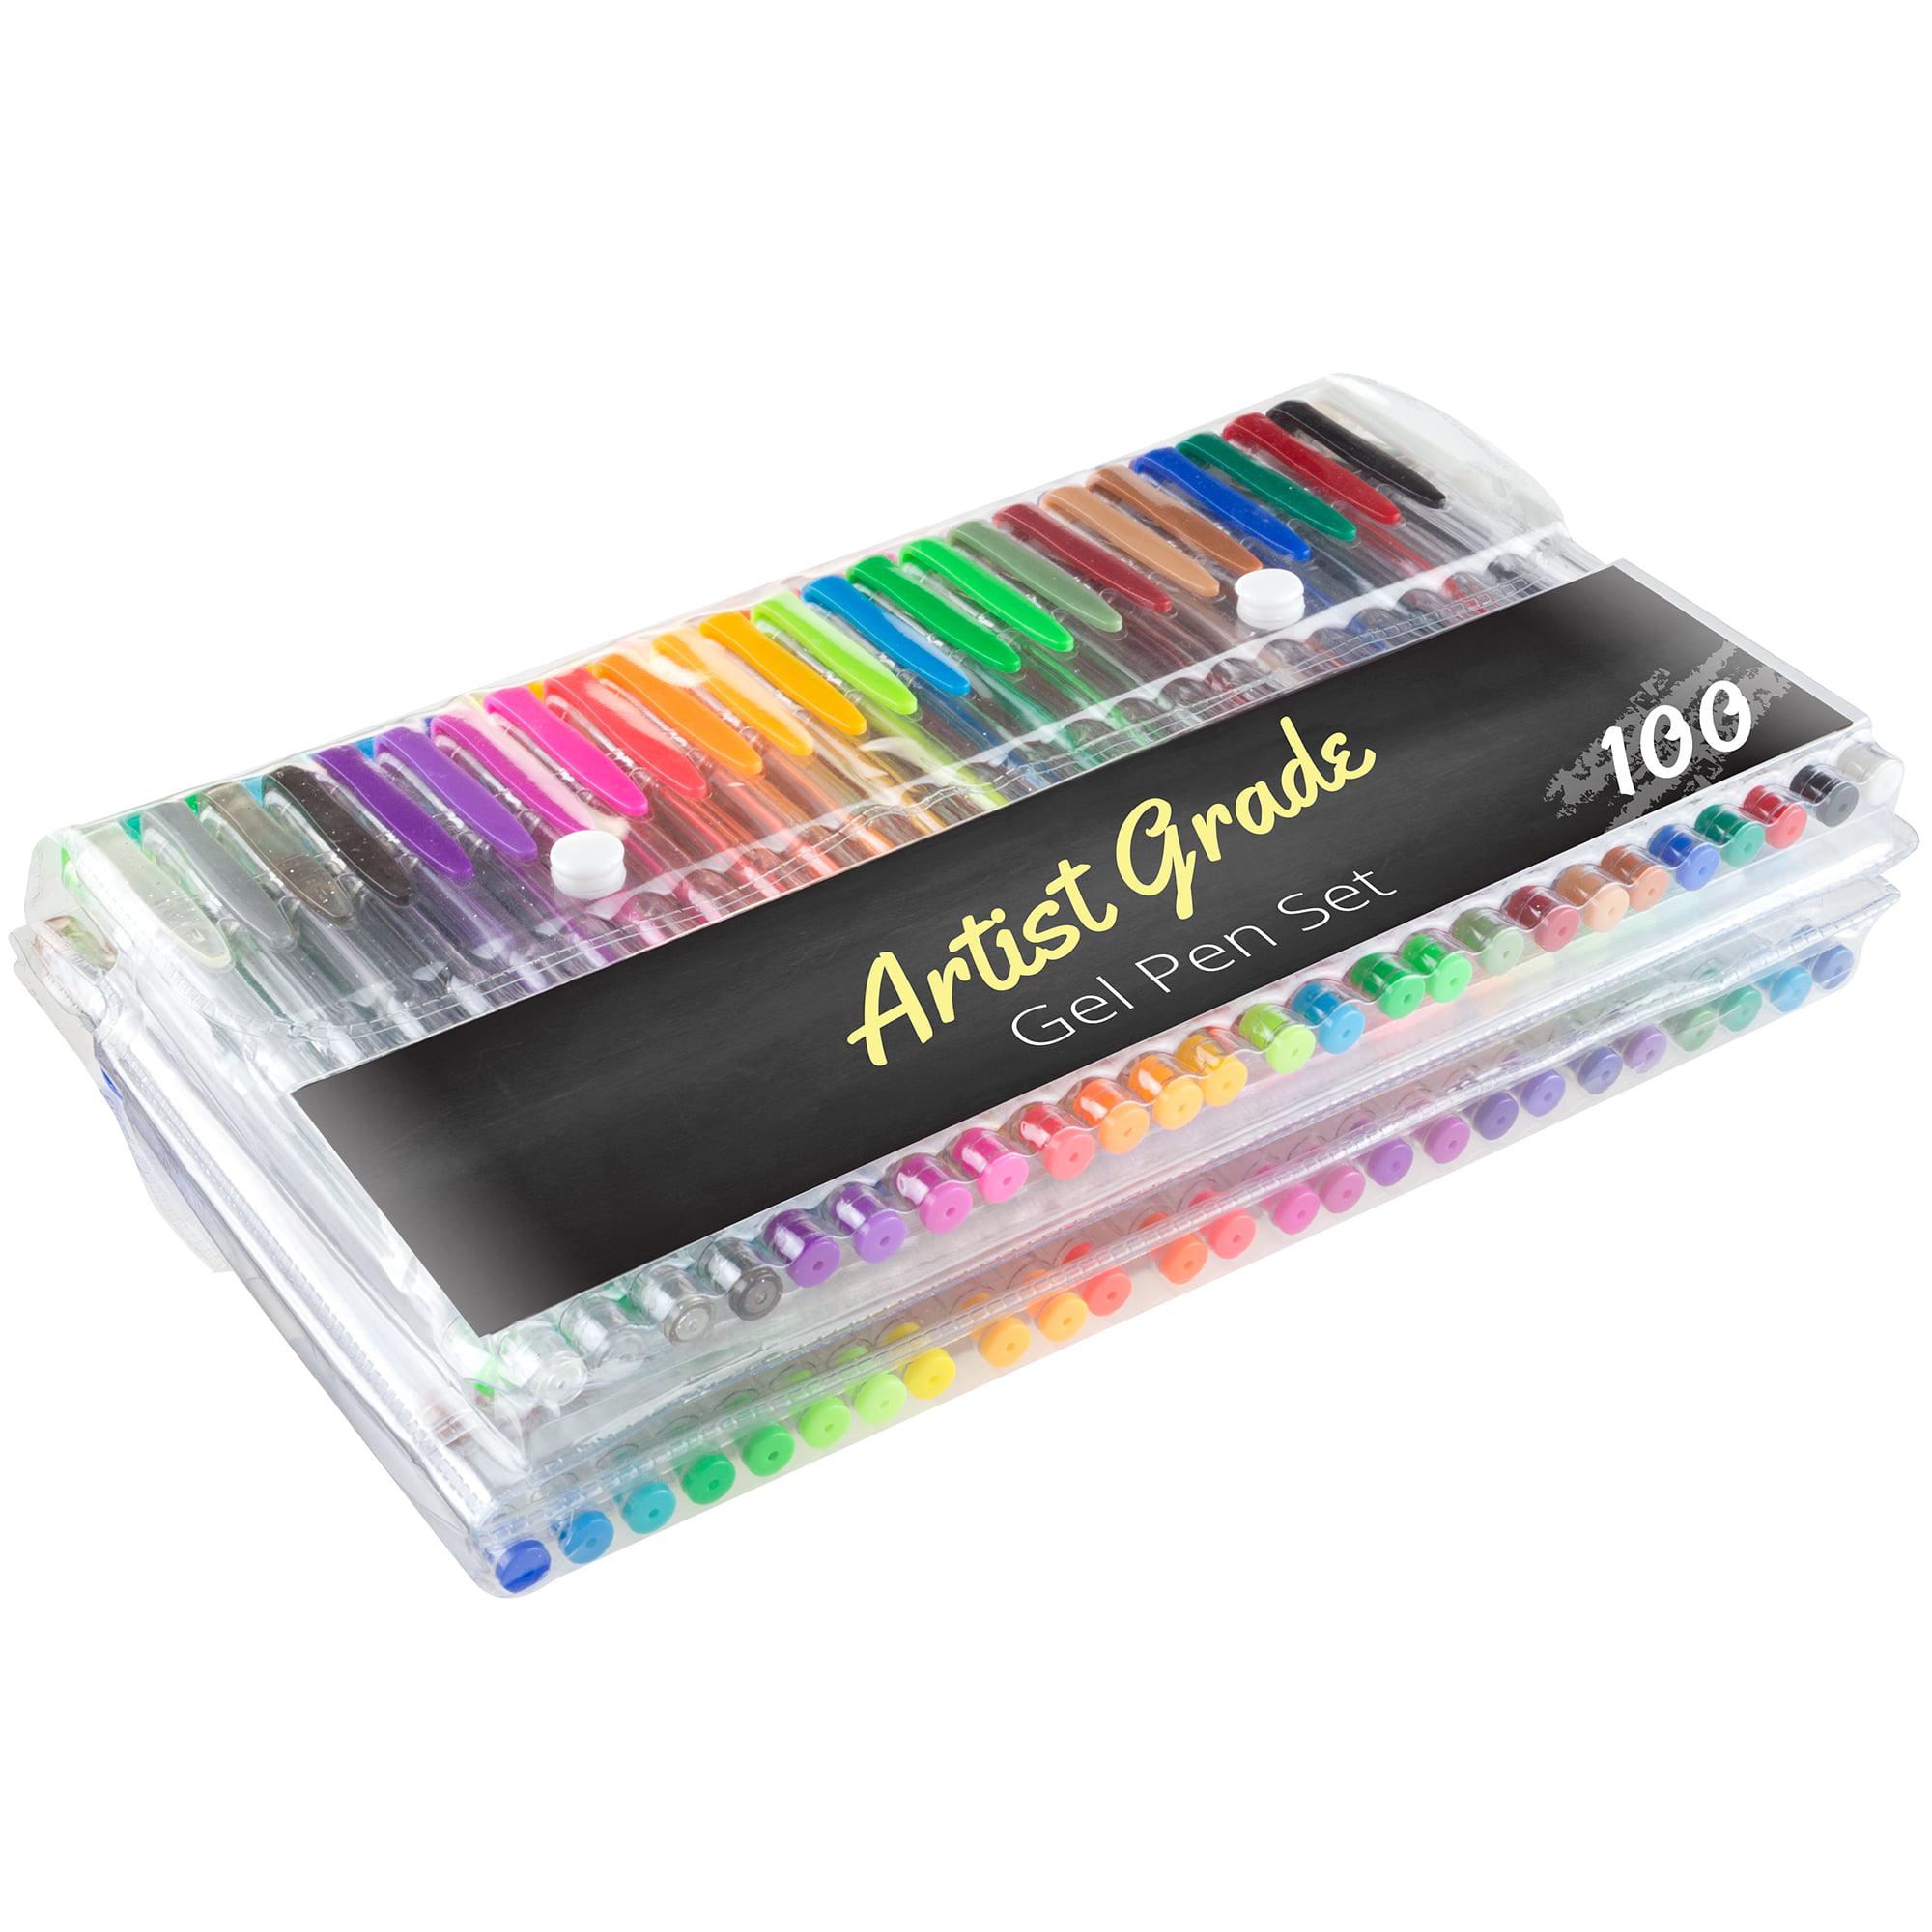 Color Gel Pen Set 100 Count for Adult Coloring Scrapbooking Doodling Comic Animation